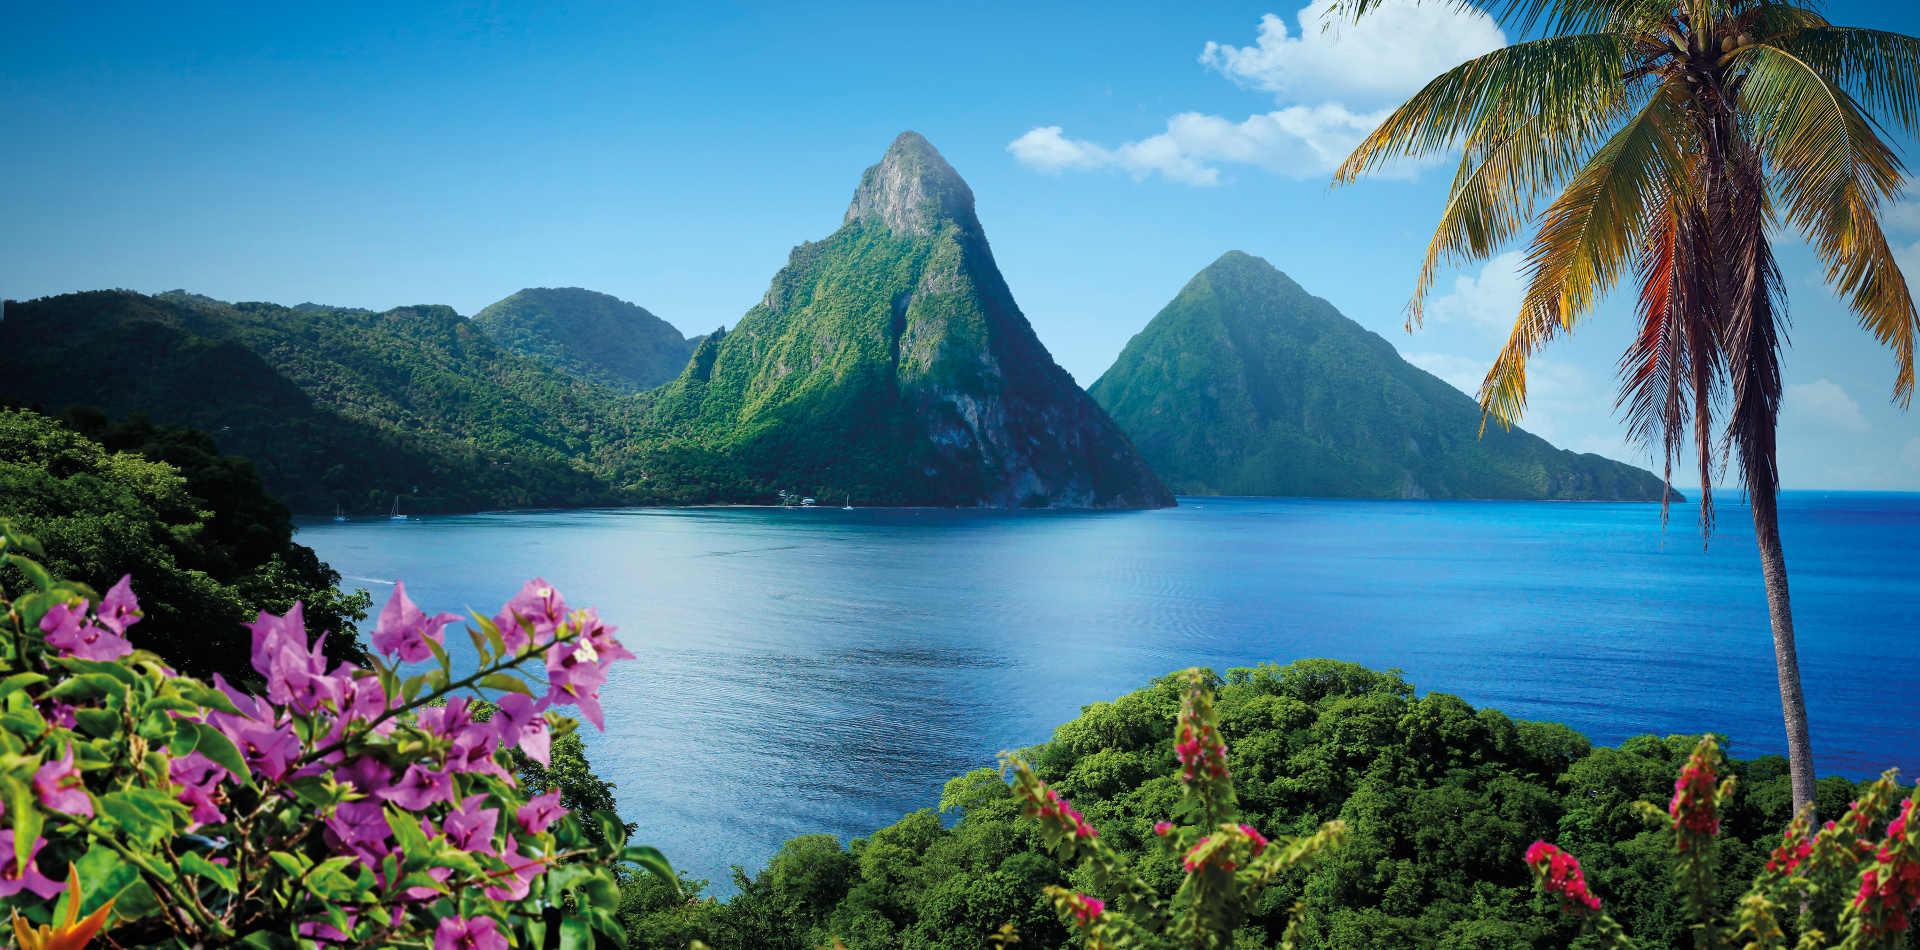 Luxusreise St. Lucia. Luxushotel St. Lucia